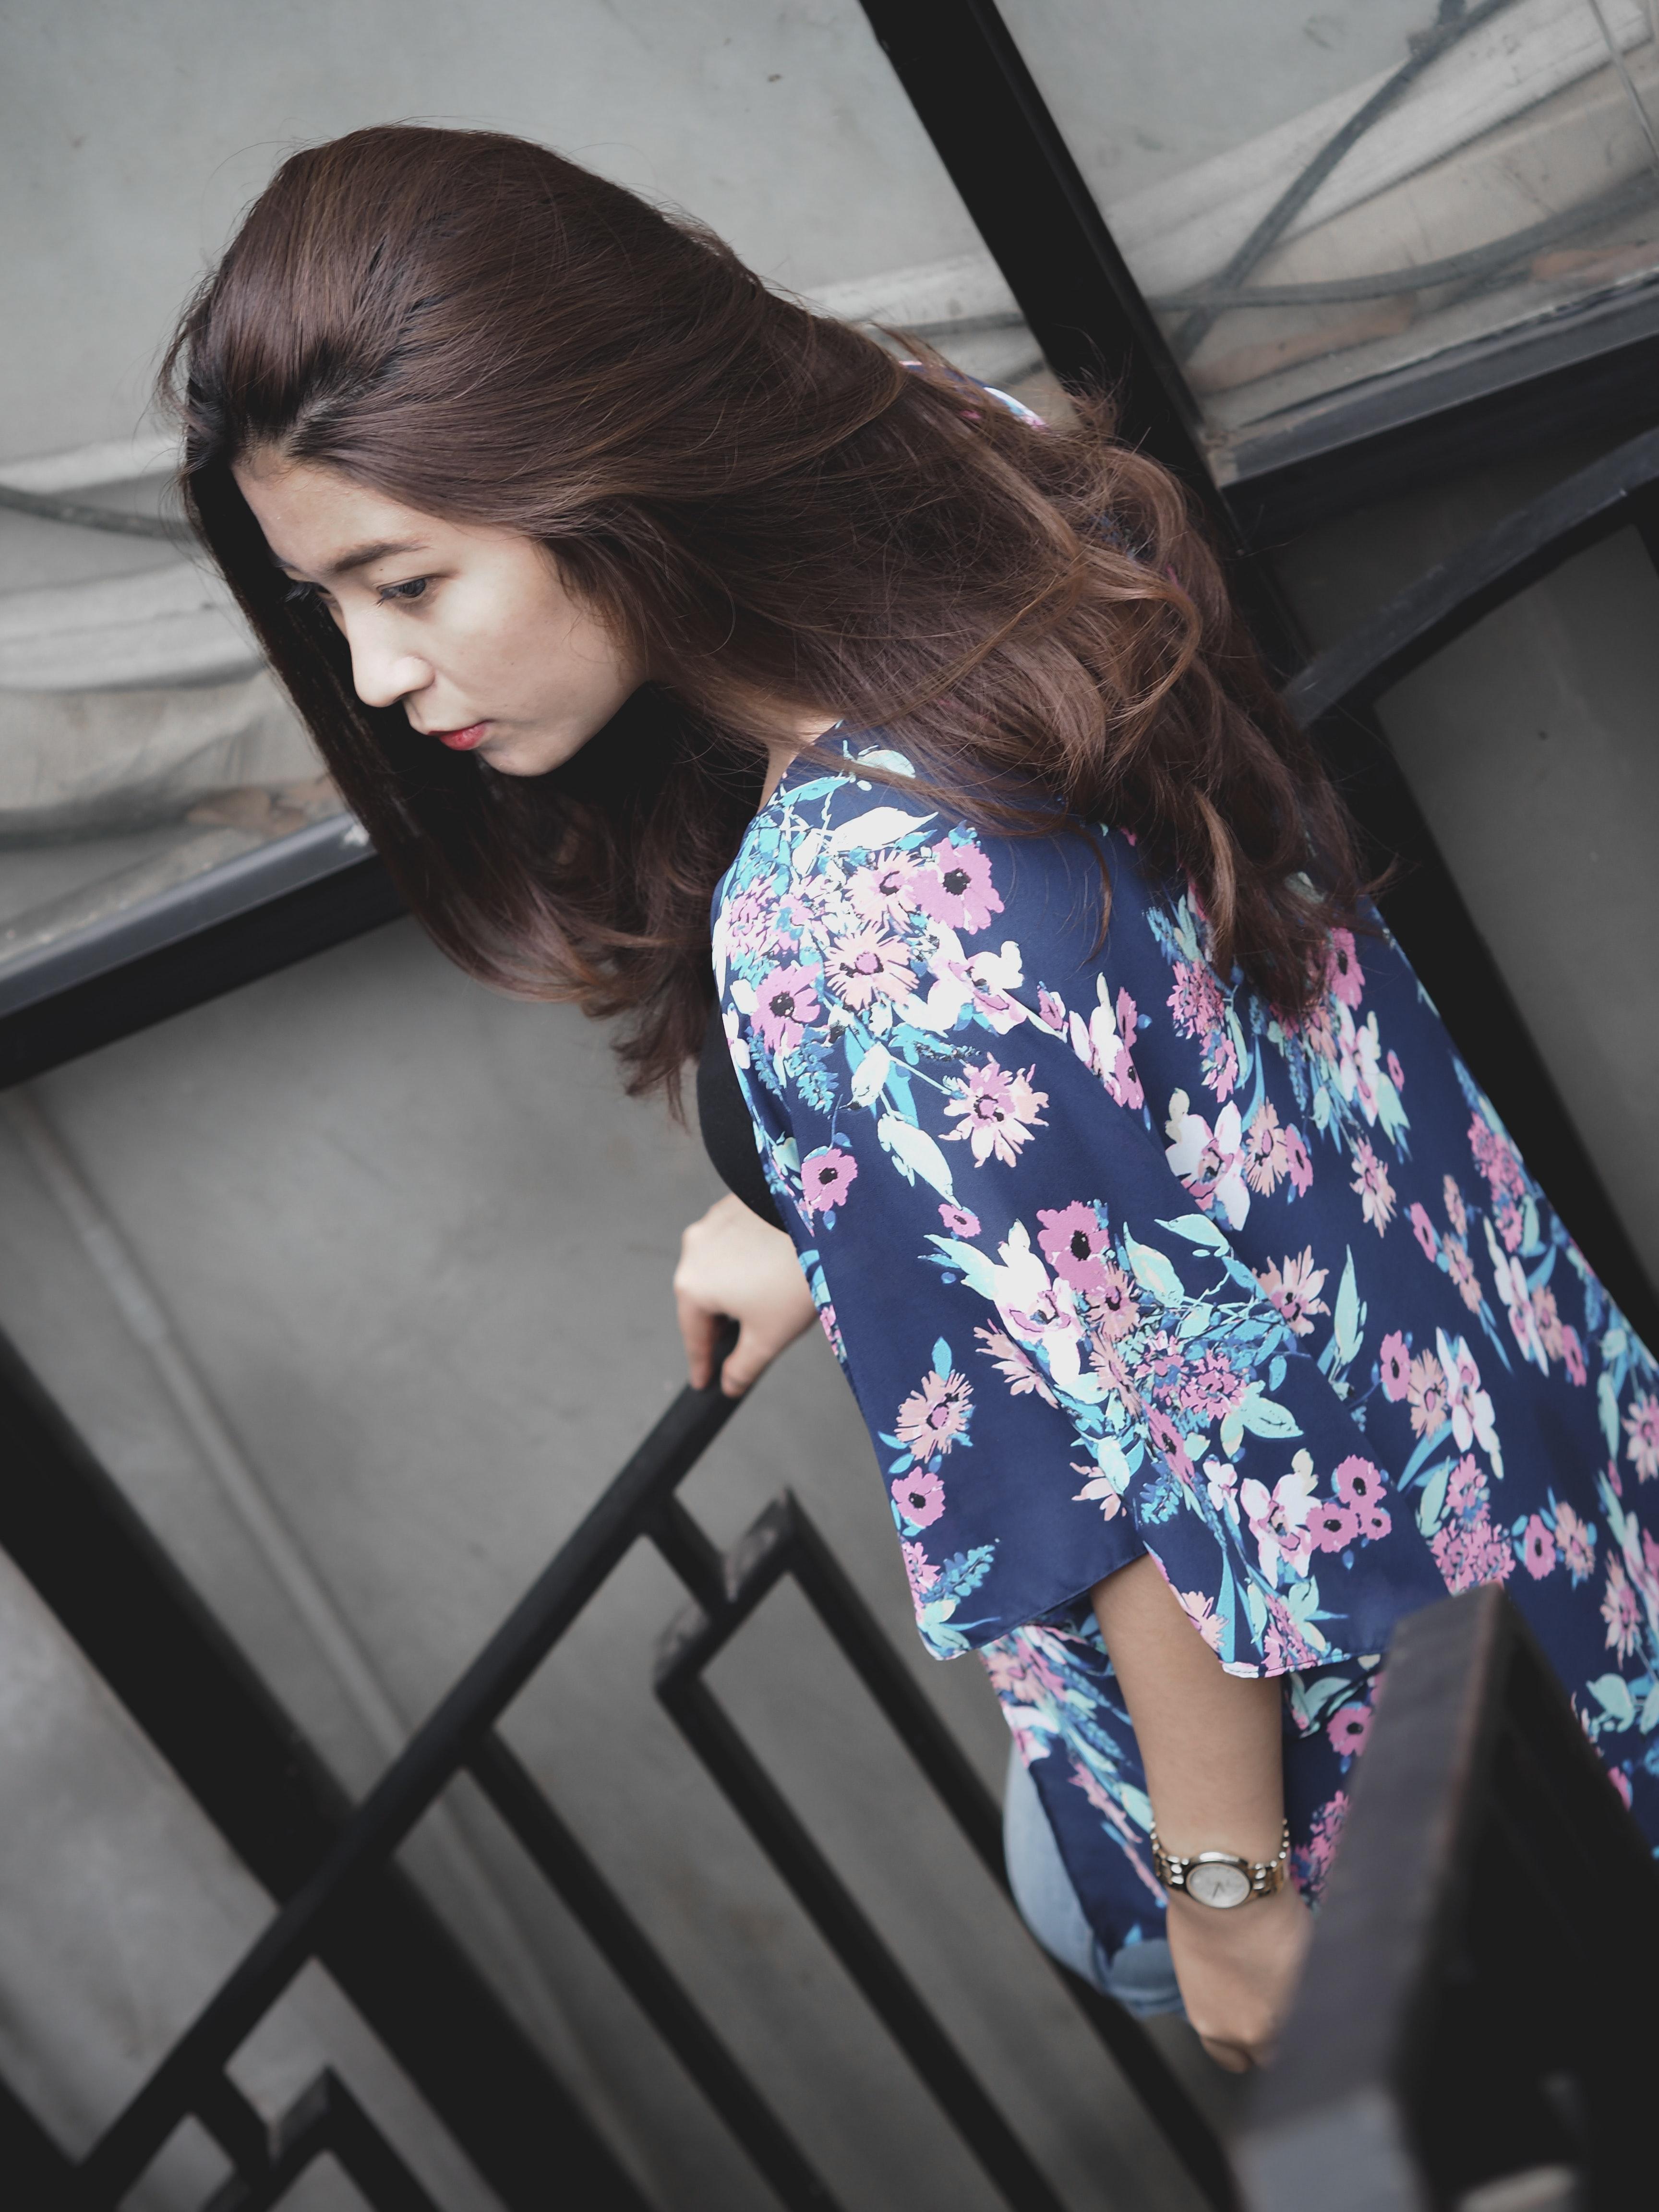 Photo of a Woman Wearing Floral Kimono, Looking, Young, Women fashion, Woman, HQ Photo